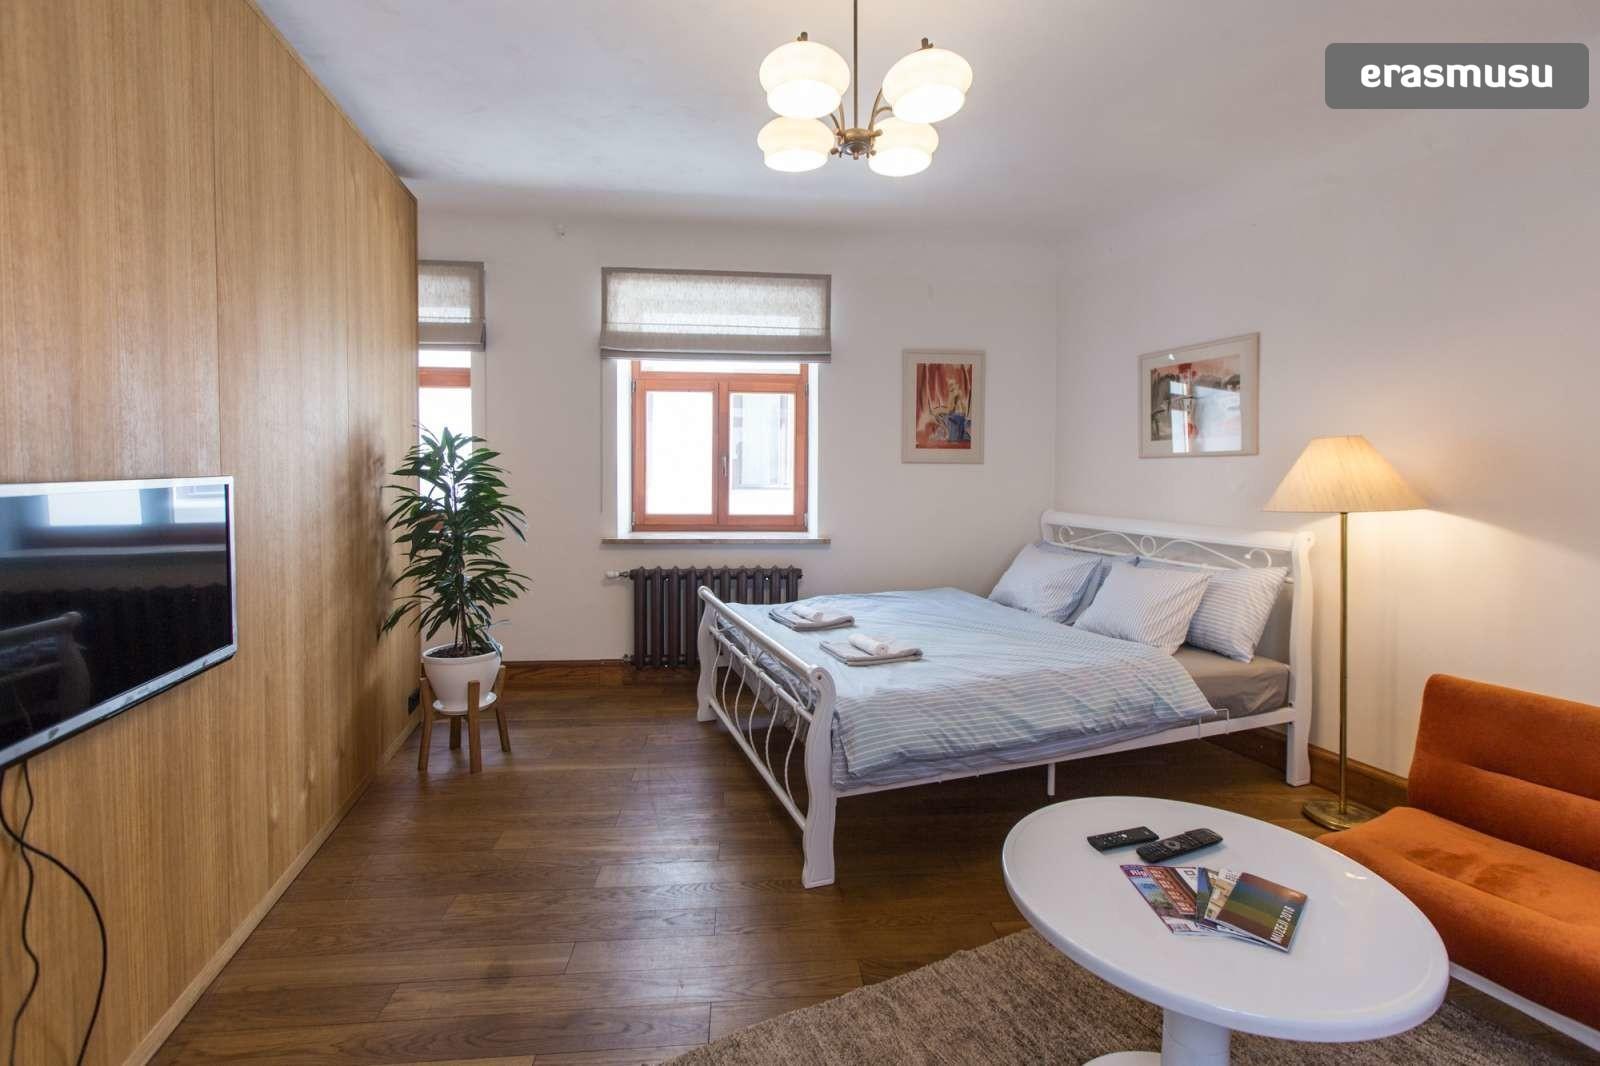 stylish-studio-apartment-rent-vecriga-641904c7973a928df641602614